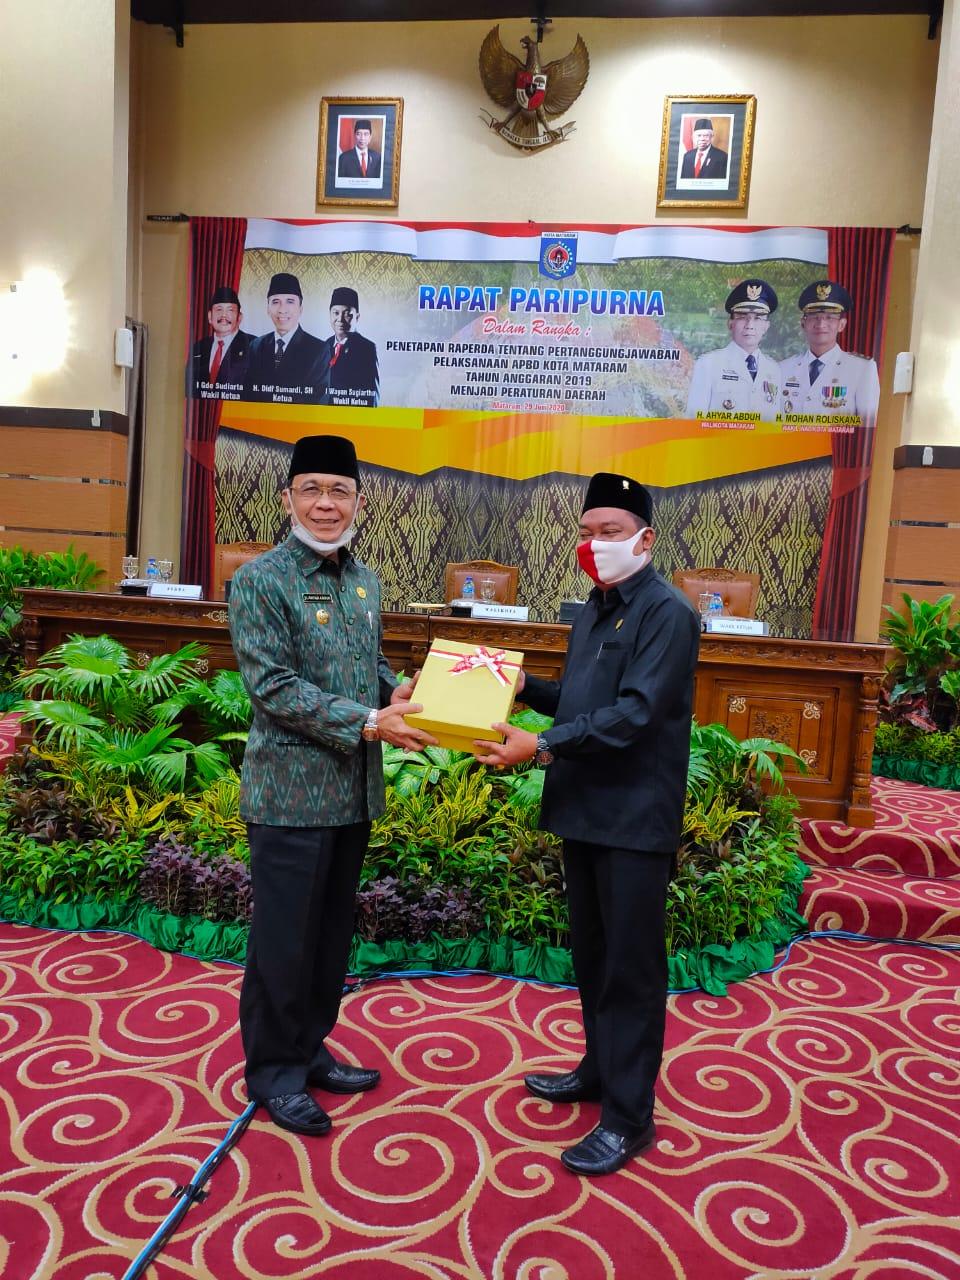 Walikota Sampaikan Pidato Pada Rapat Paripurna DPRD Kota Mataram